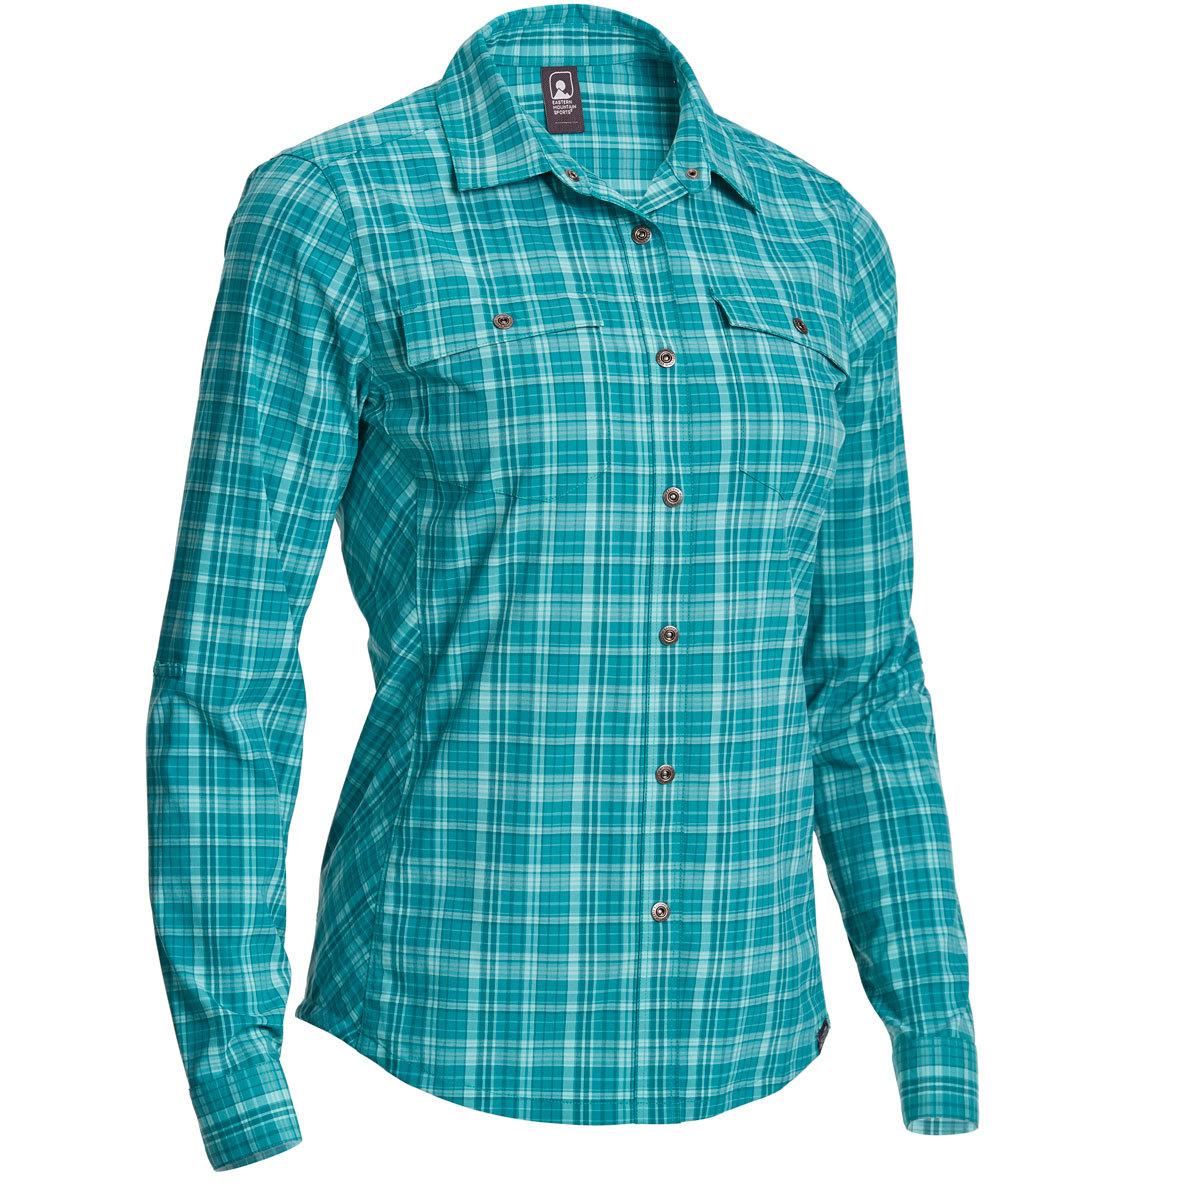 Ems Women's Journey Plaid Long-Sleeve Shirt - Green, M